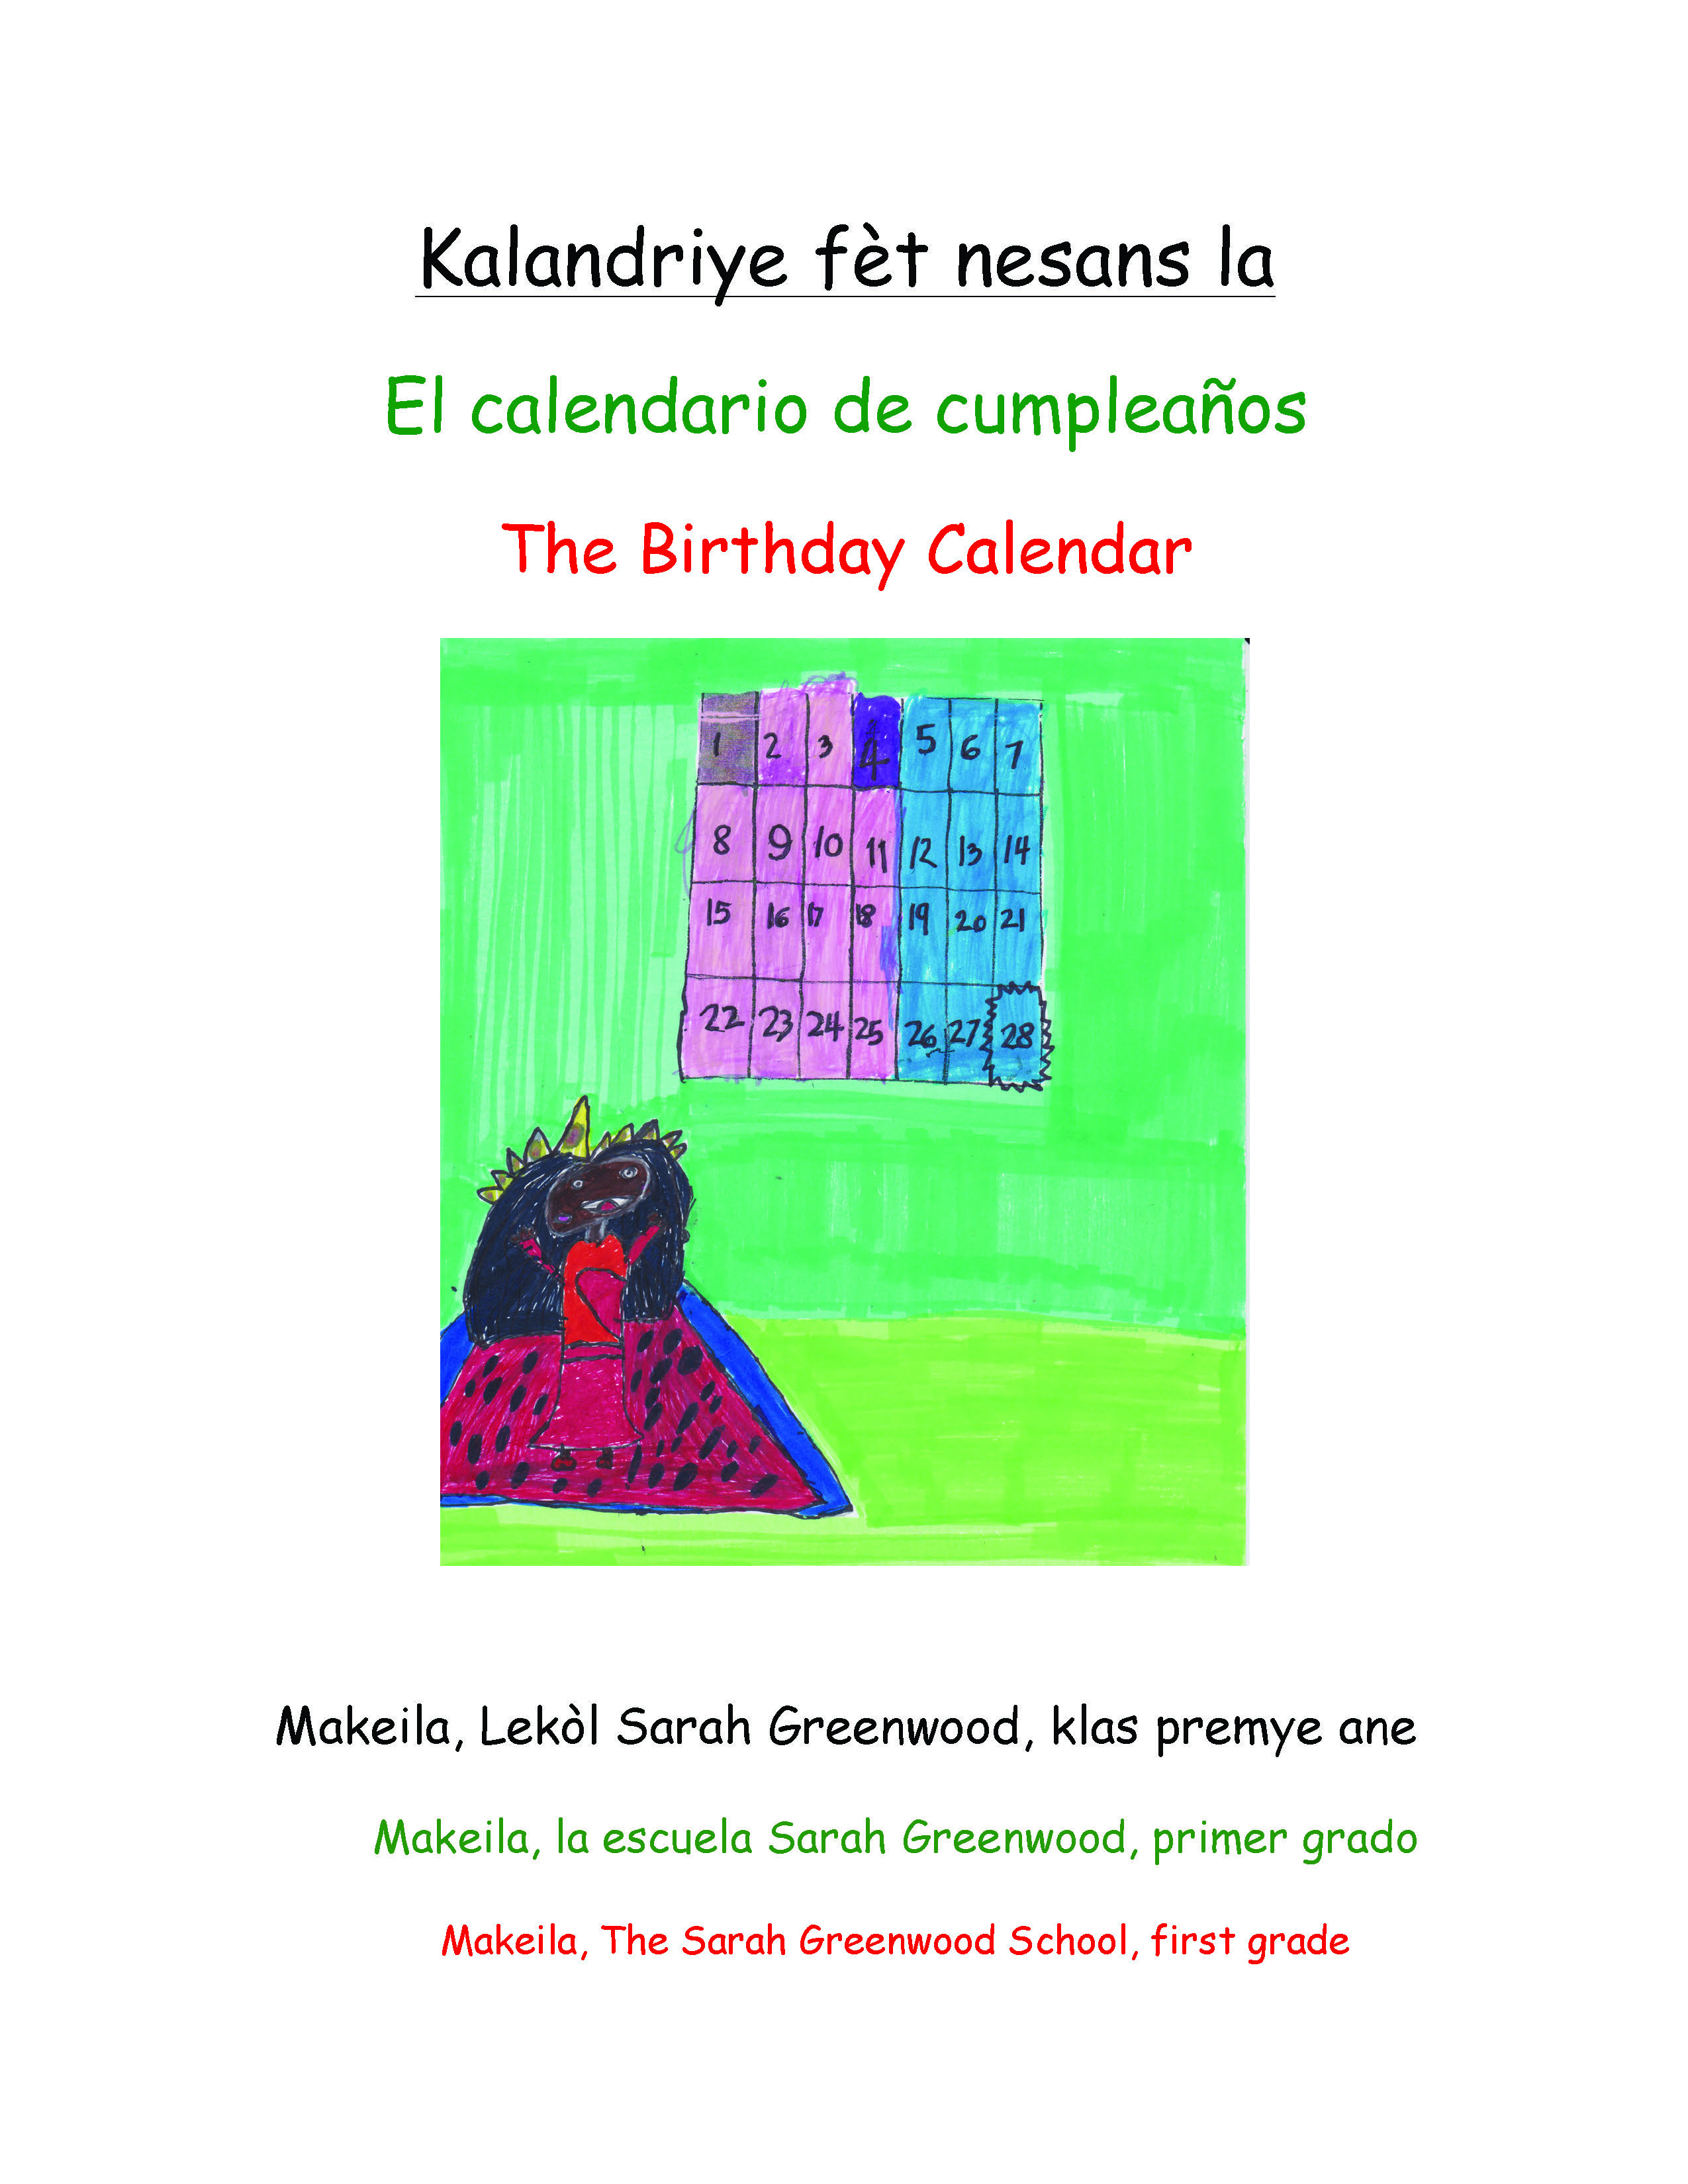 Kalandriye fèt nesans la / The Birthday Calendar